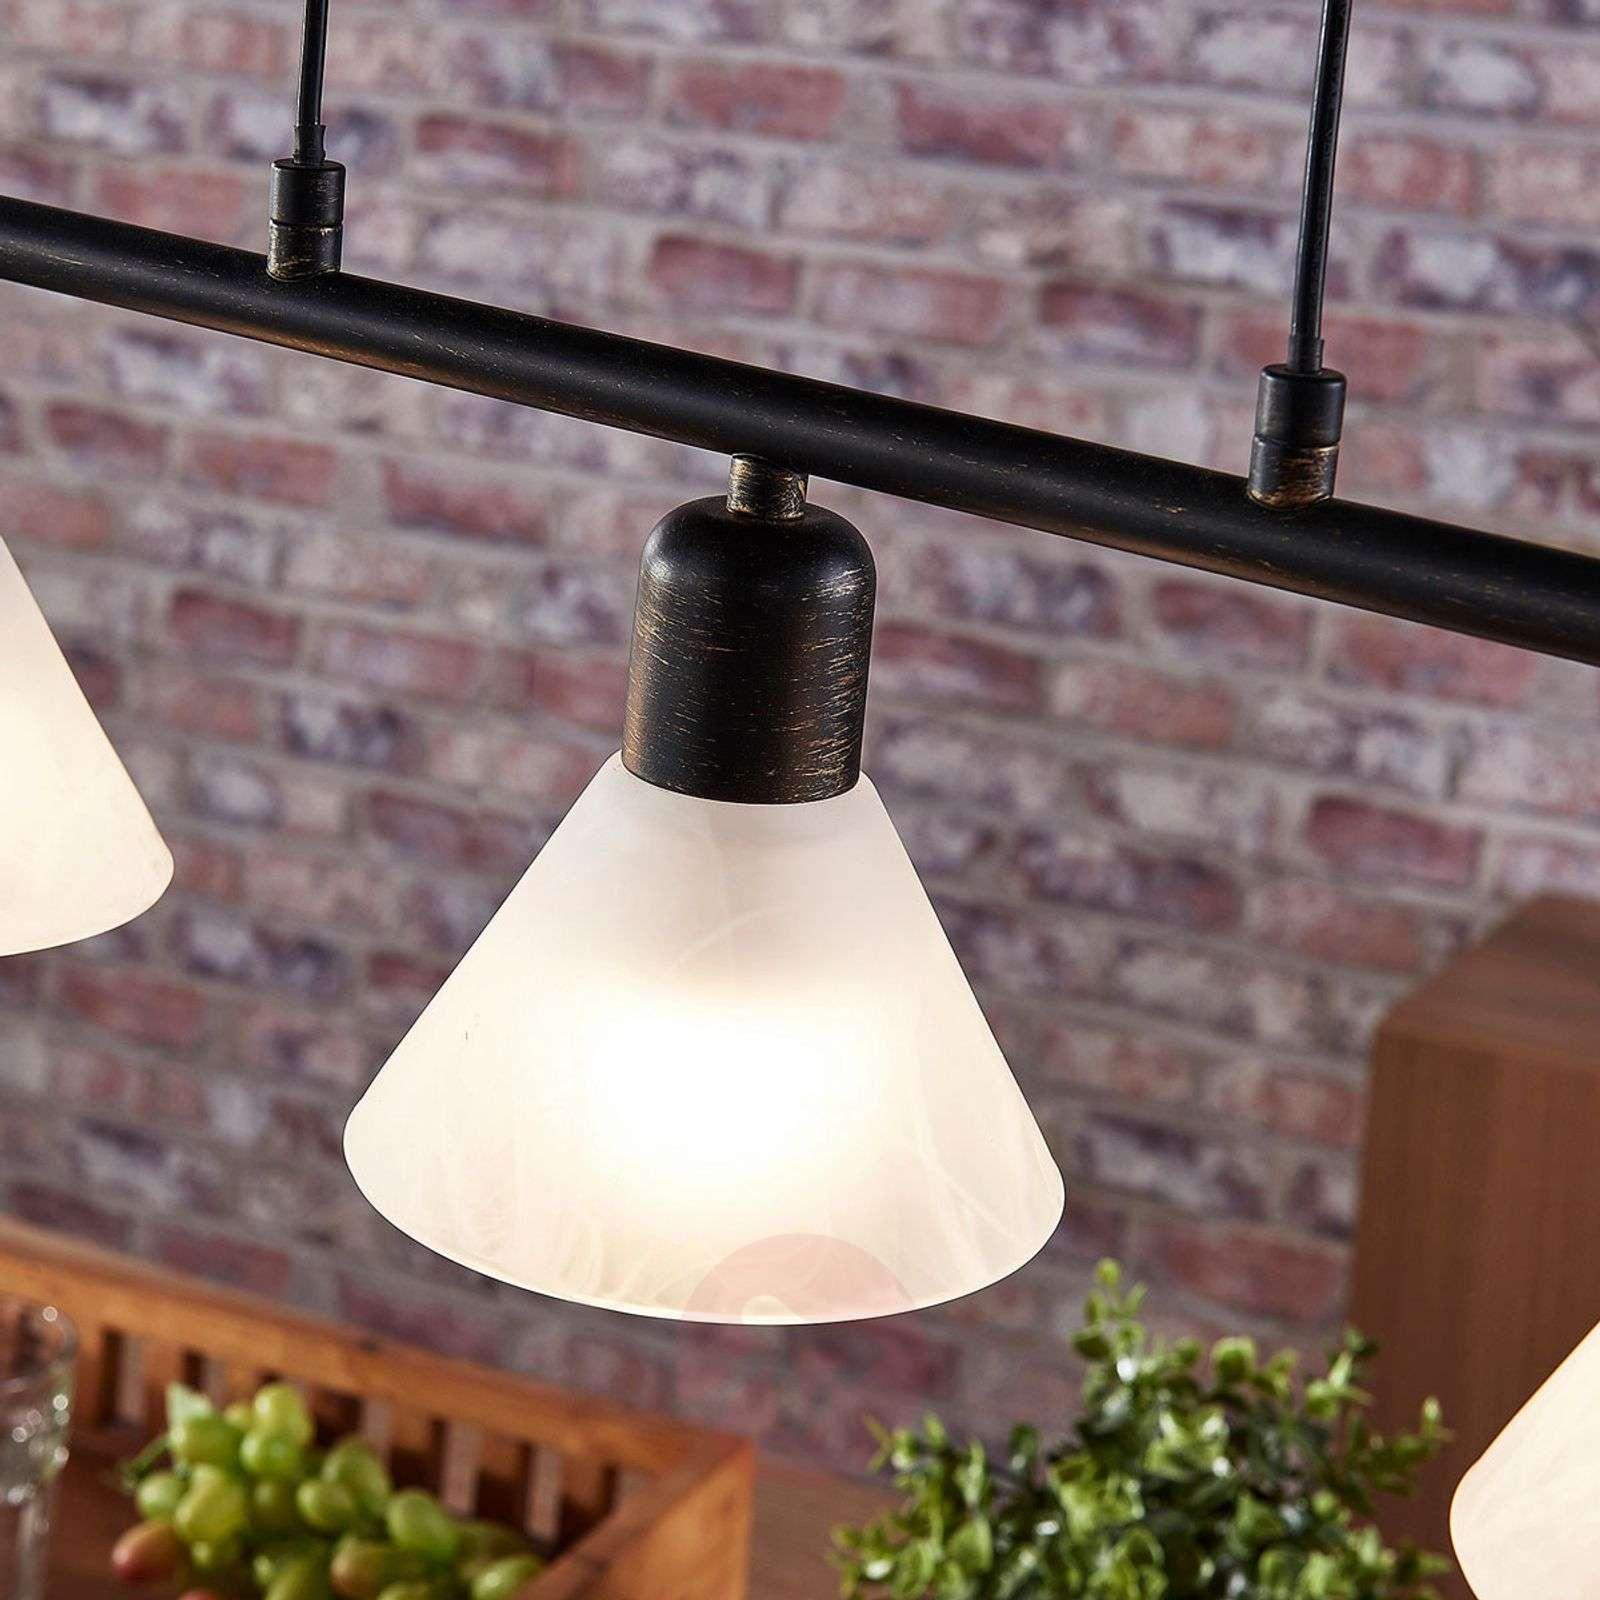 Black LED hanging light Eleasa, Easydim-9621383-02